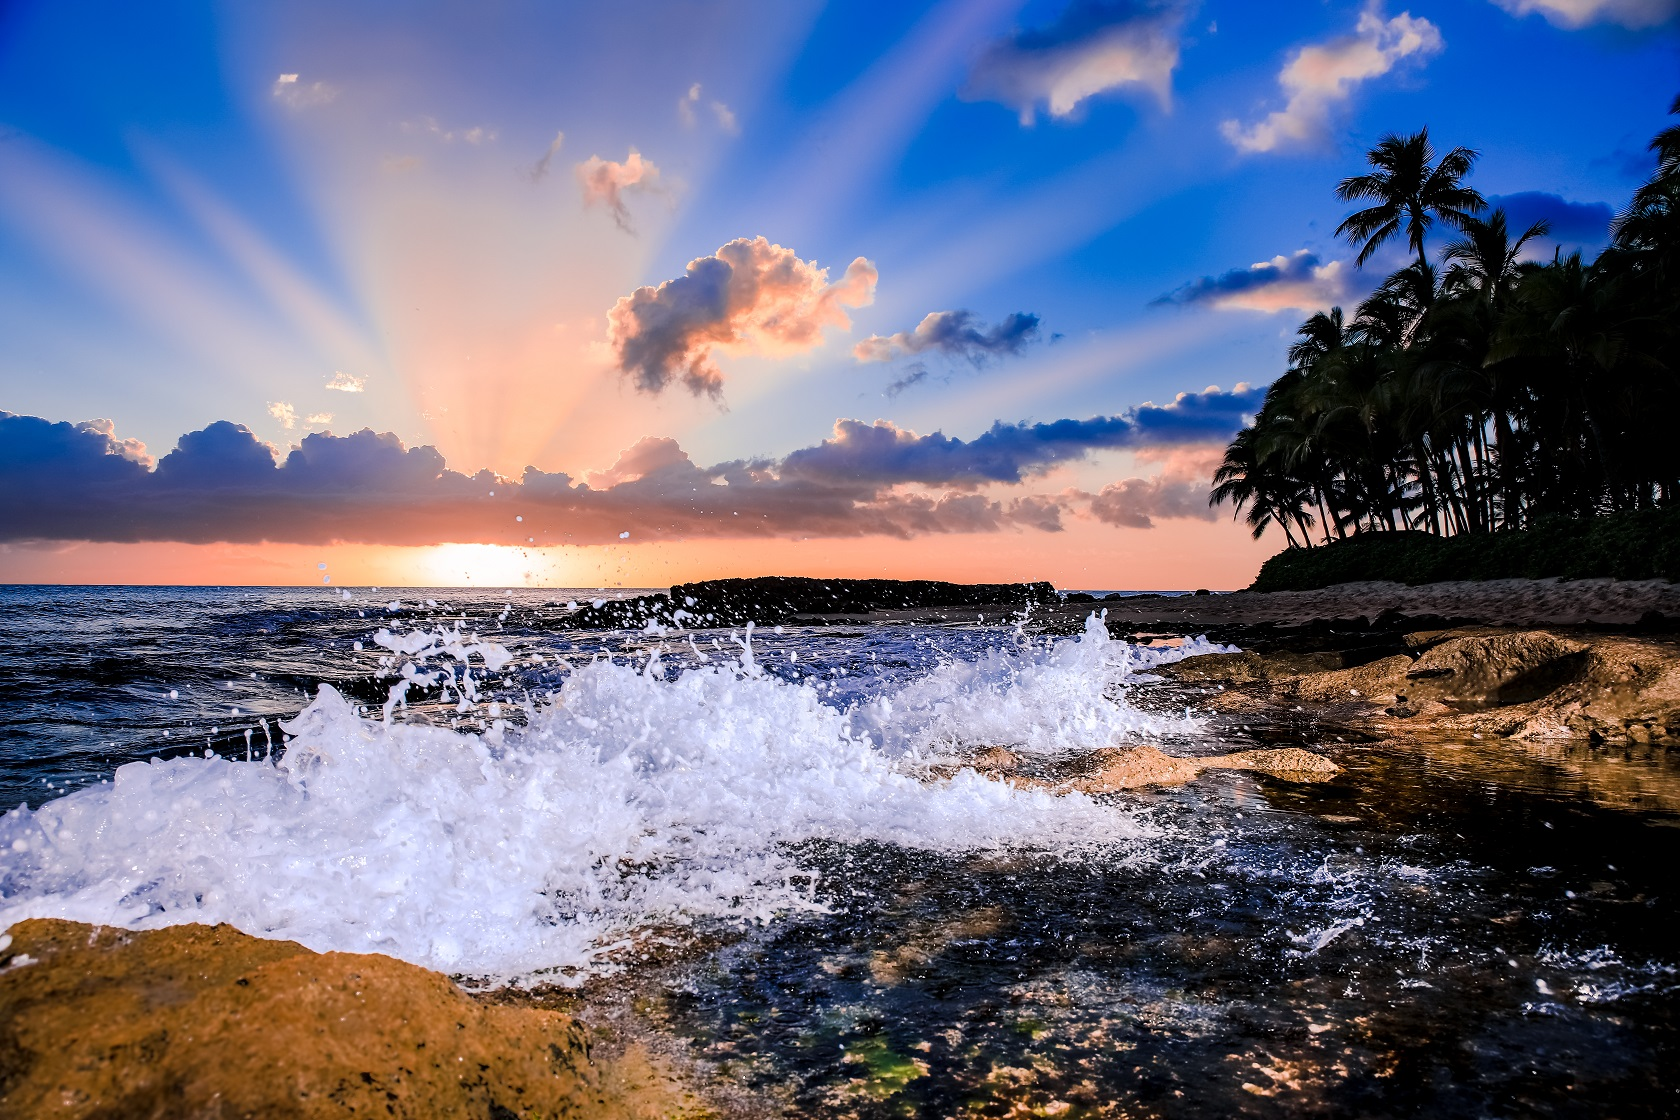 sunset over hawaii ocean palm trees crashing waves fine art